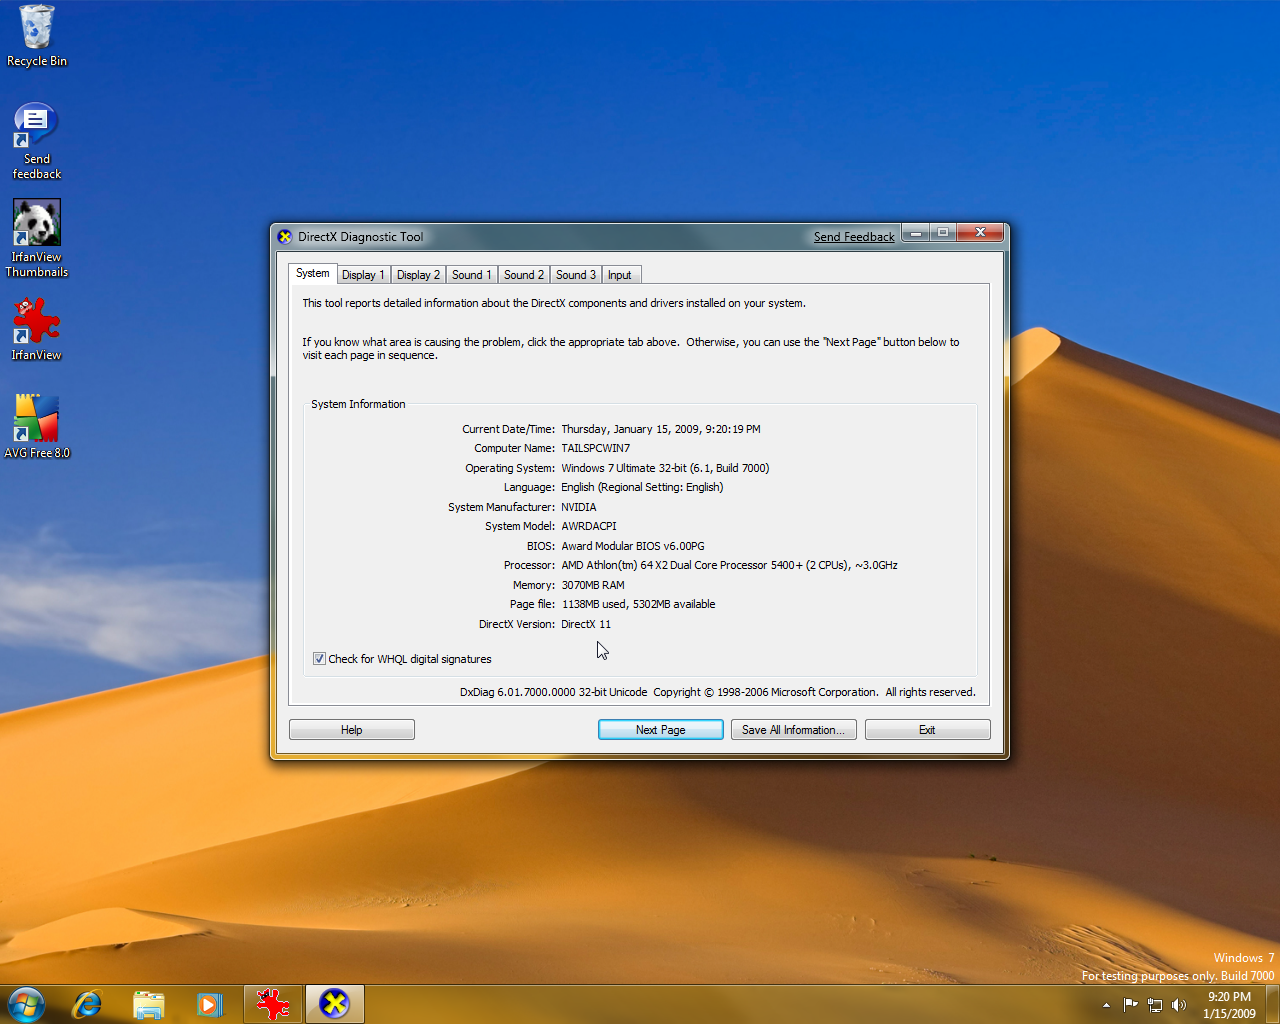 Windows 7 Beta - DXdiag (DirectX 11?) | Screenshots Archive